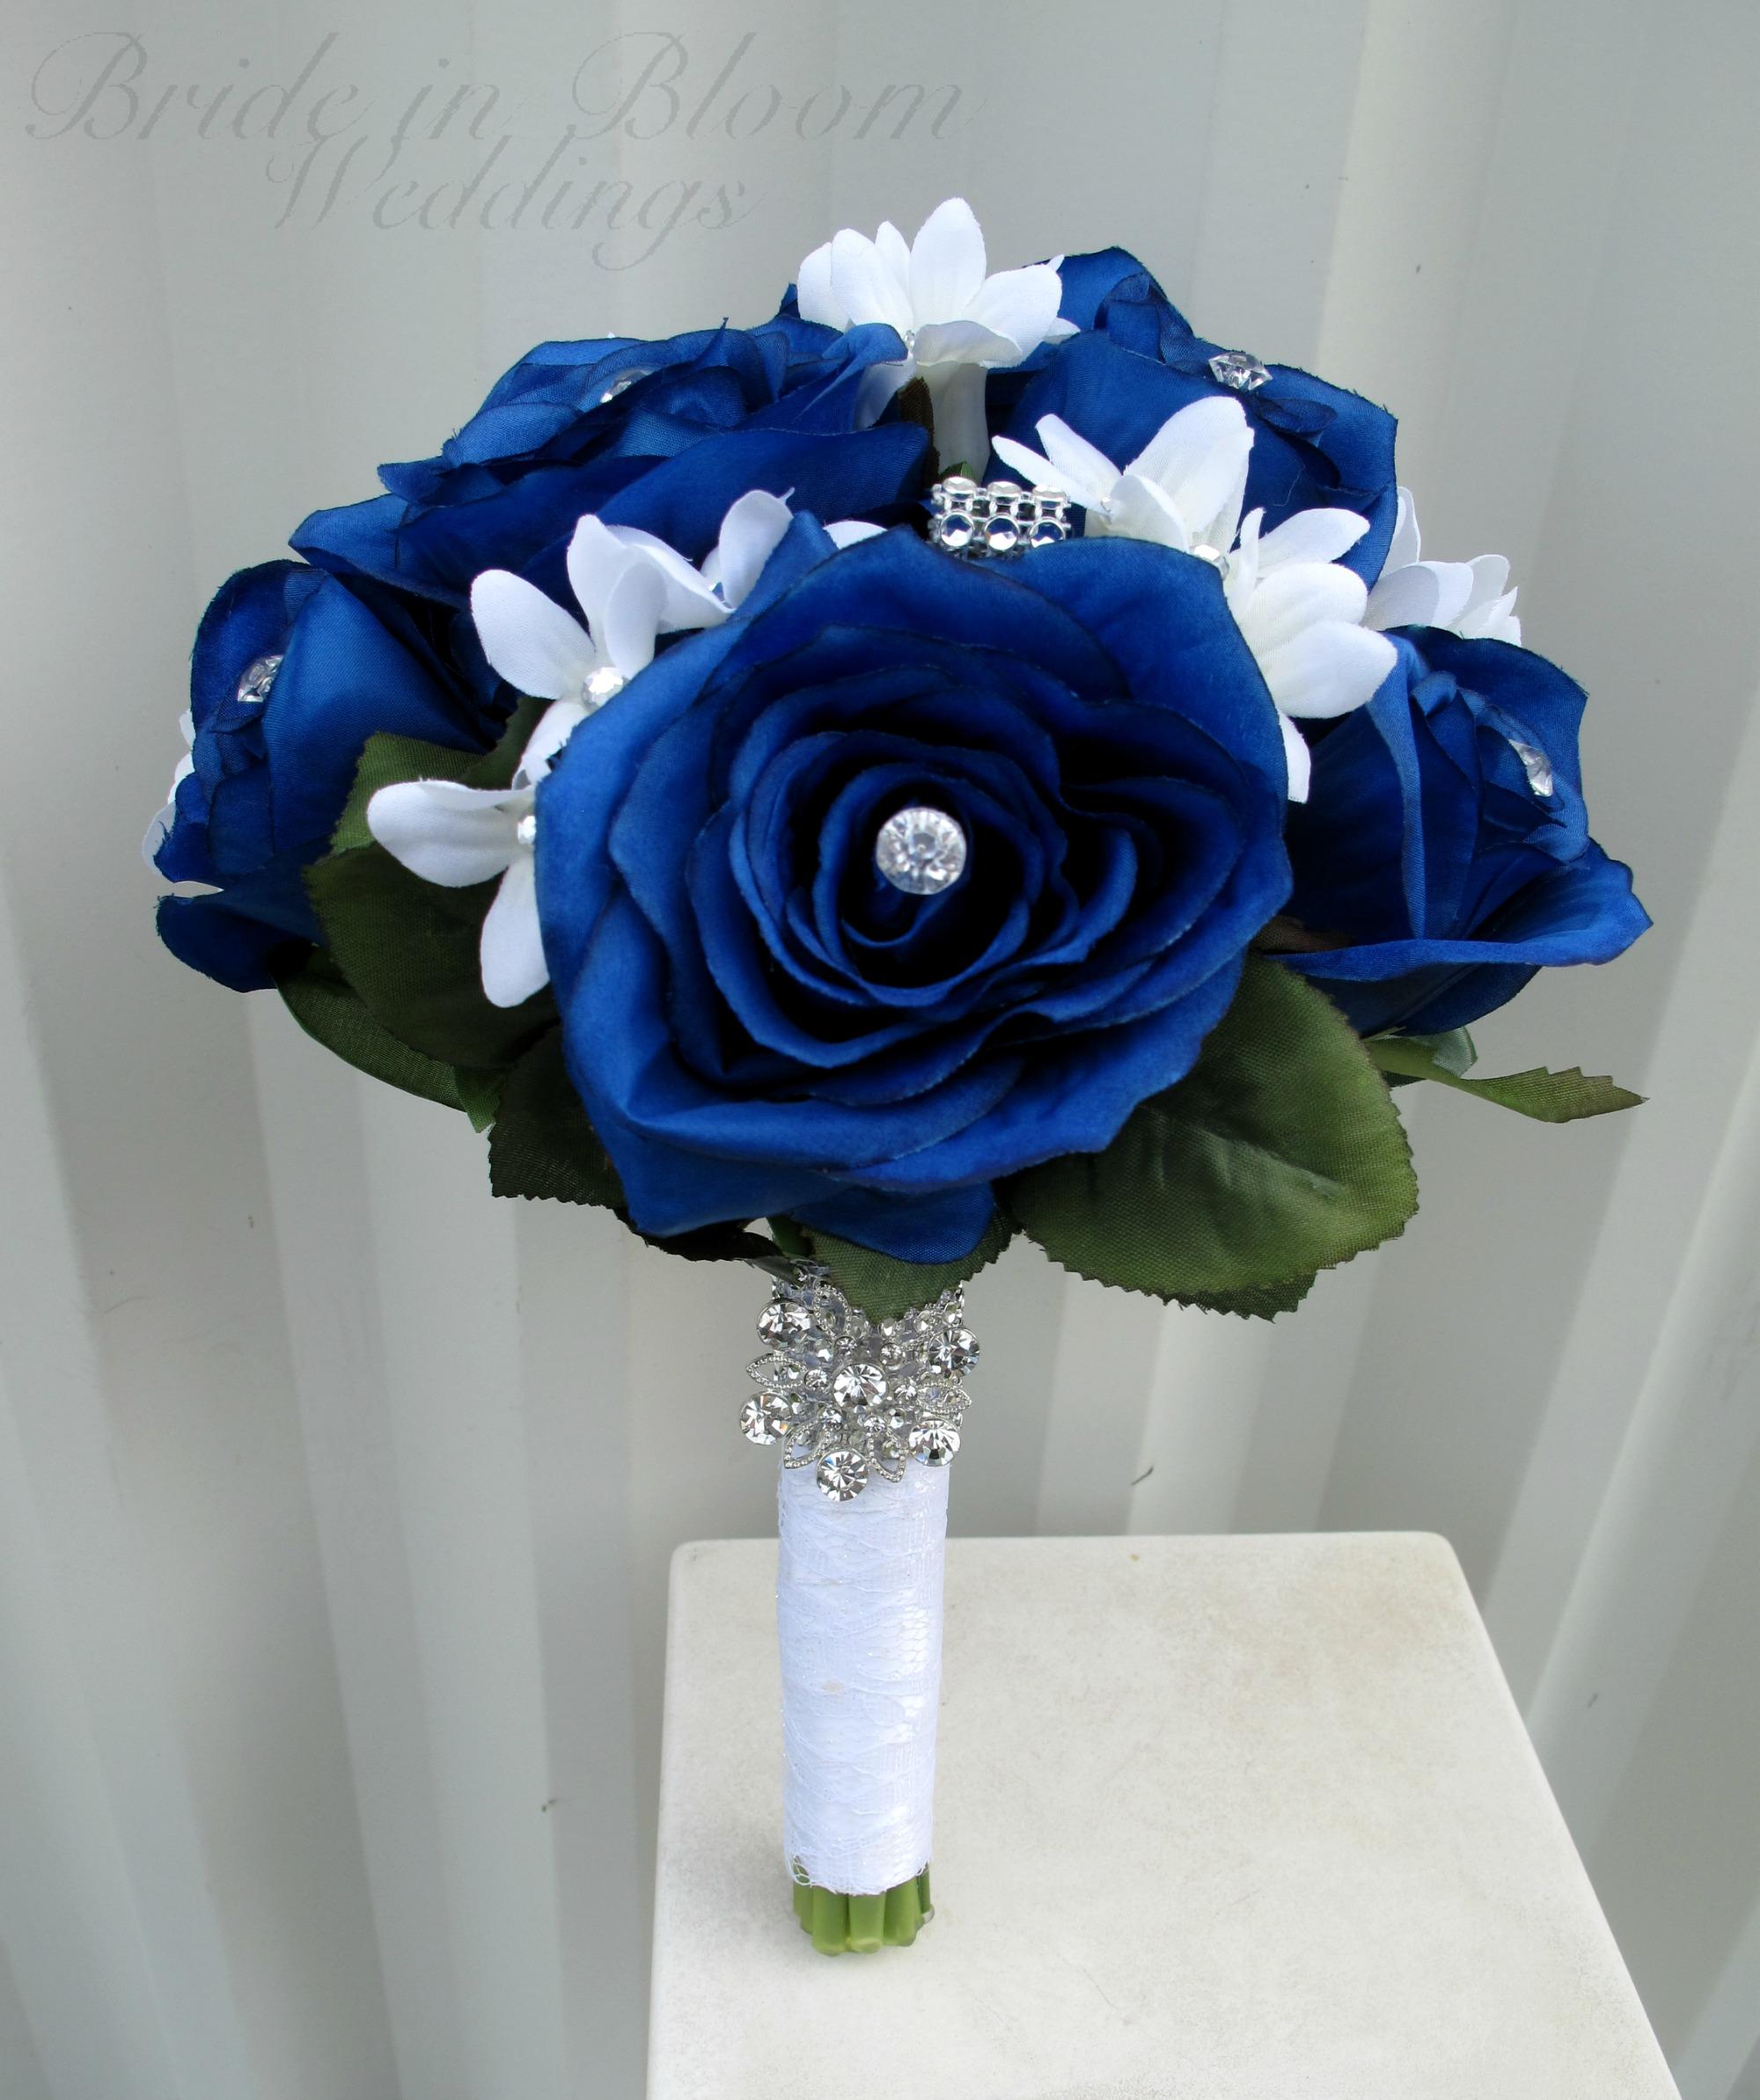 Royal Blue Luxury Rhinestone Artificial Bridal Wedding Bouquets Ramo Novia Mariage Bridesmaid Flower Accessoires China